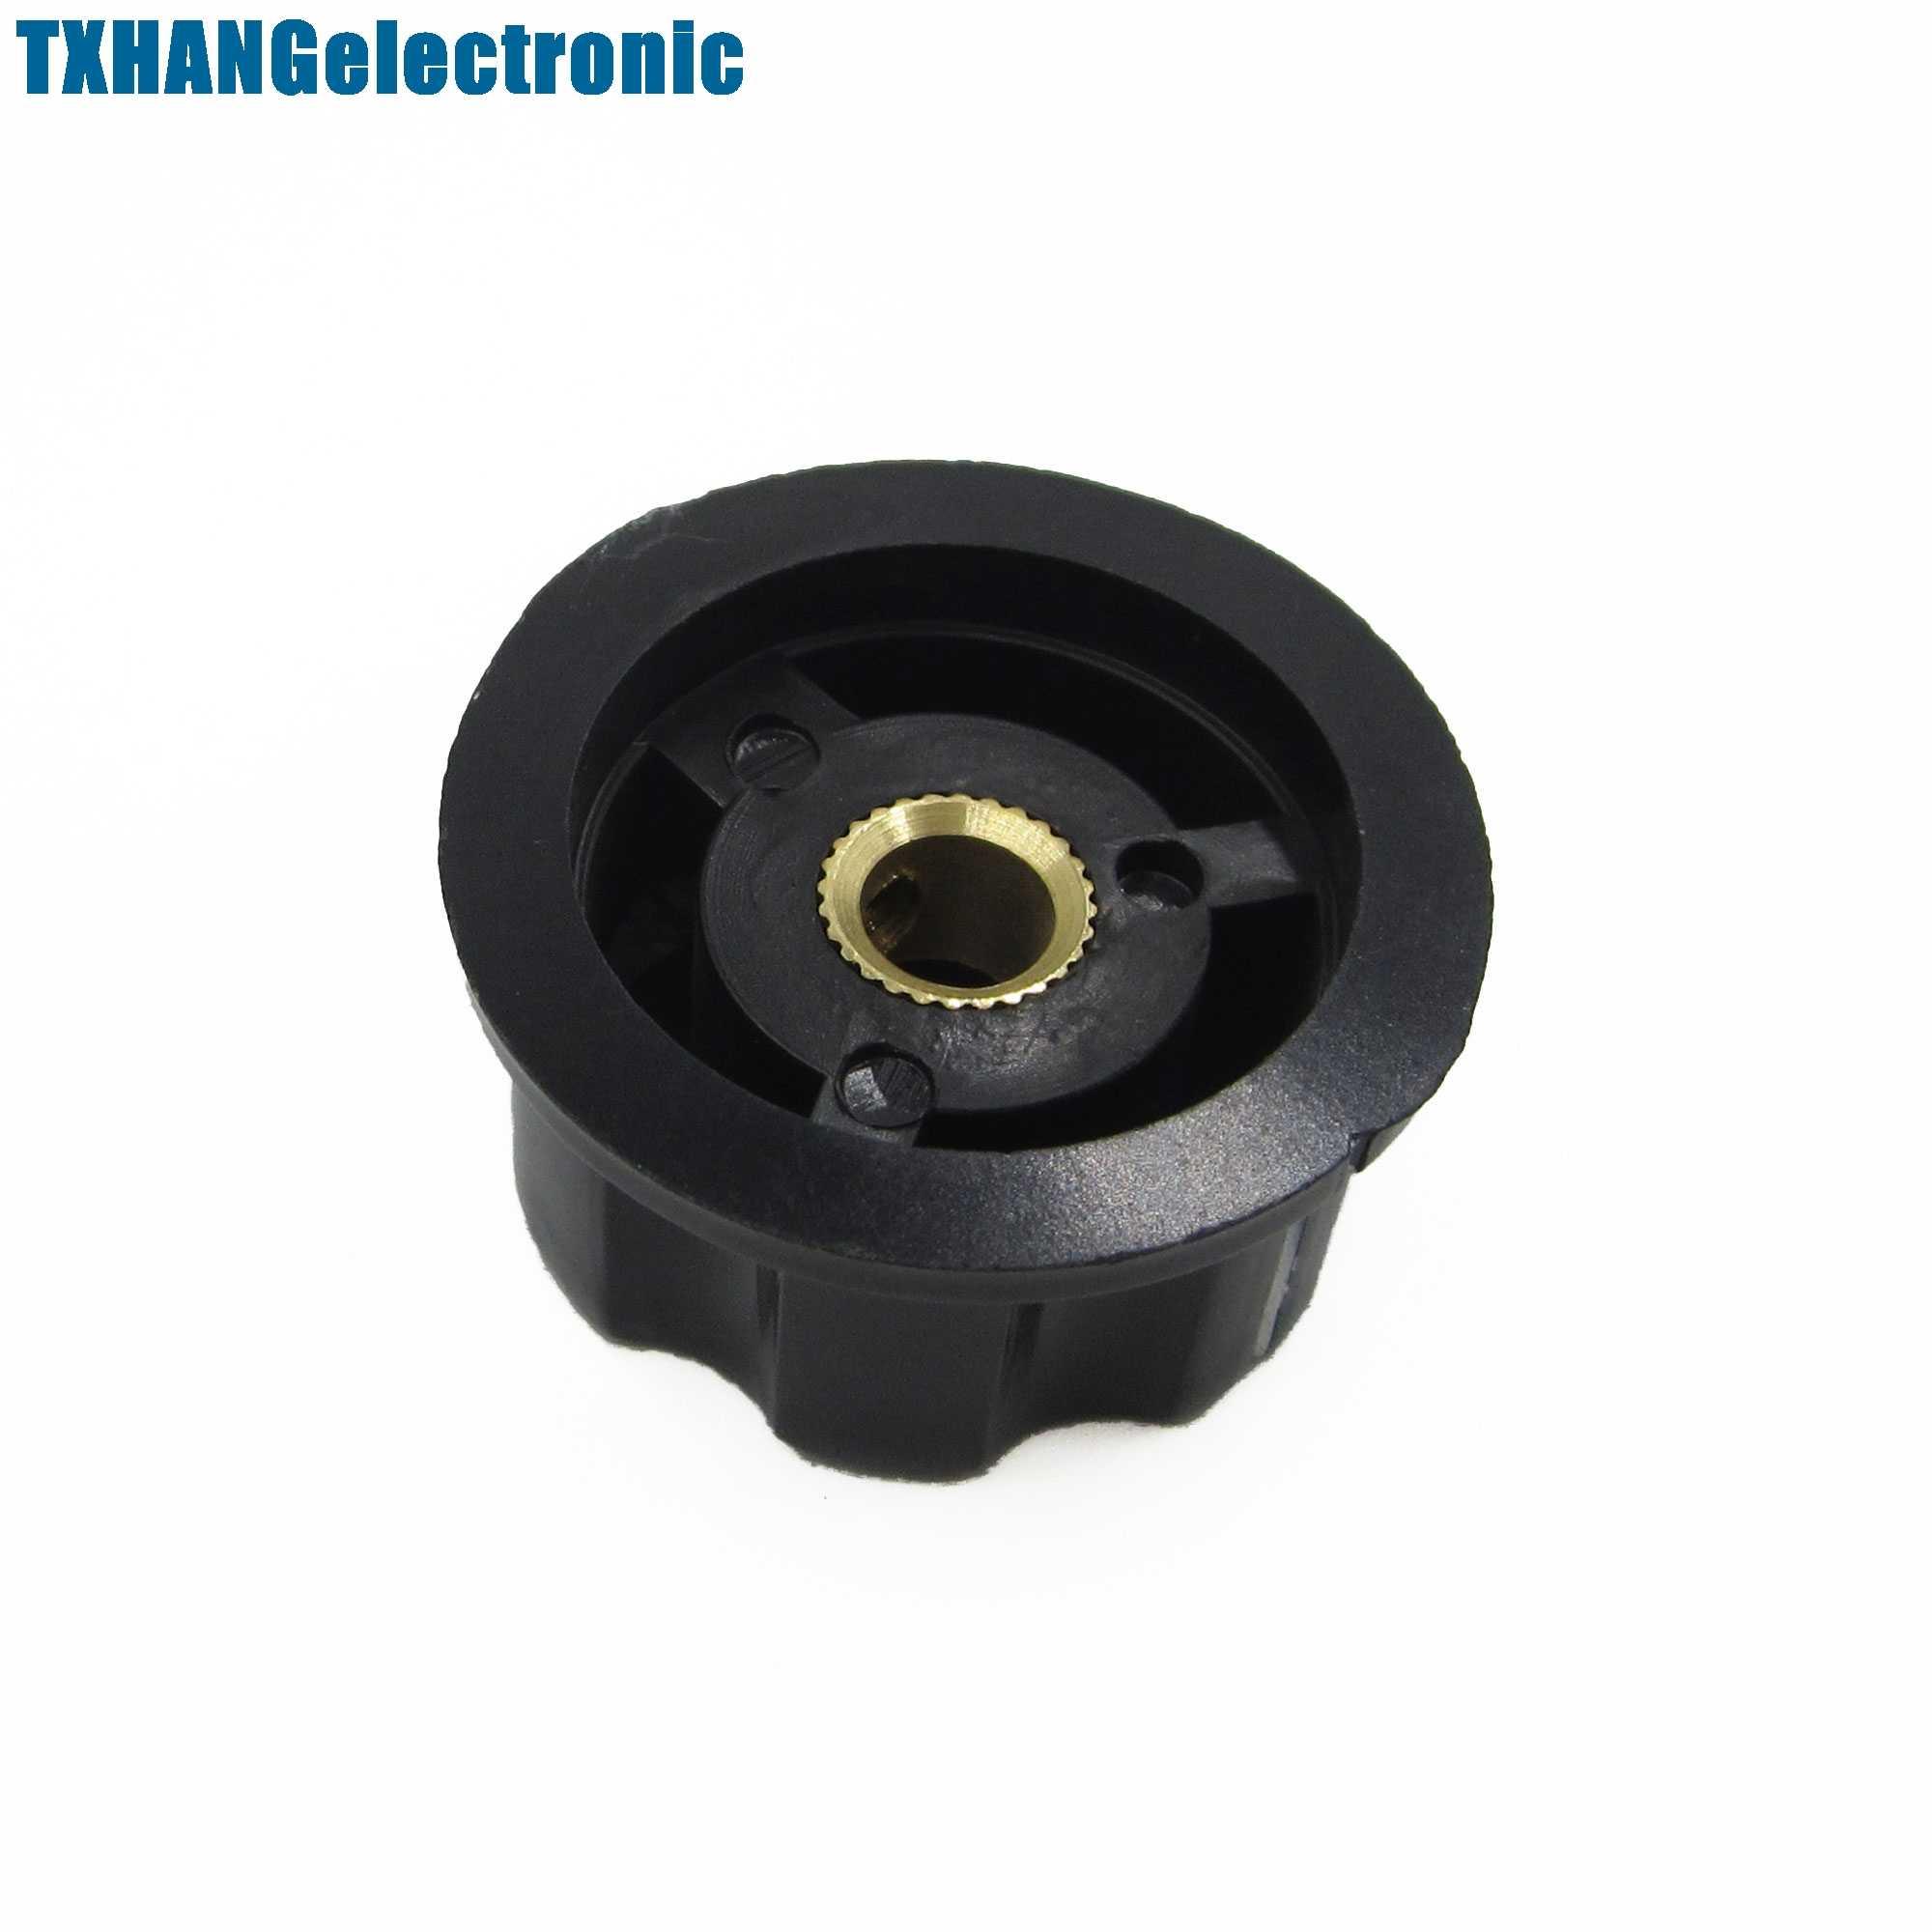 2PCS Adjustable Turn Shaft Insert 16mm Top 6mm Dia Potentiometer Rotary Knobs